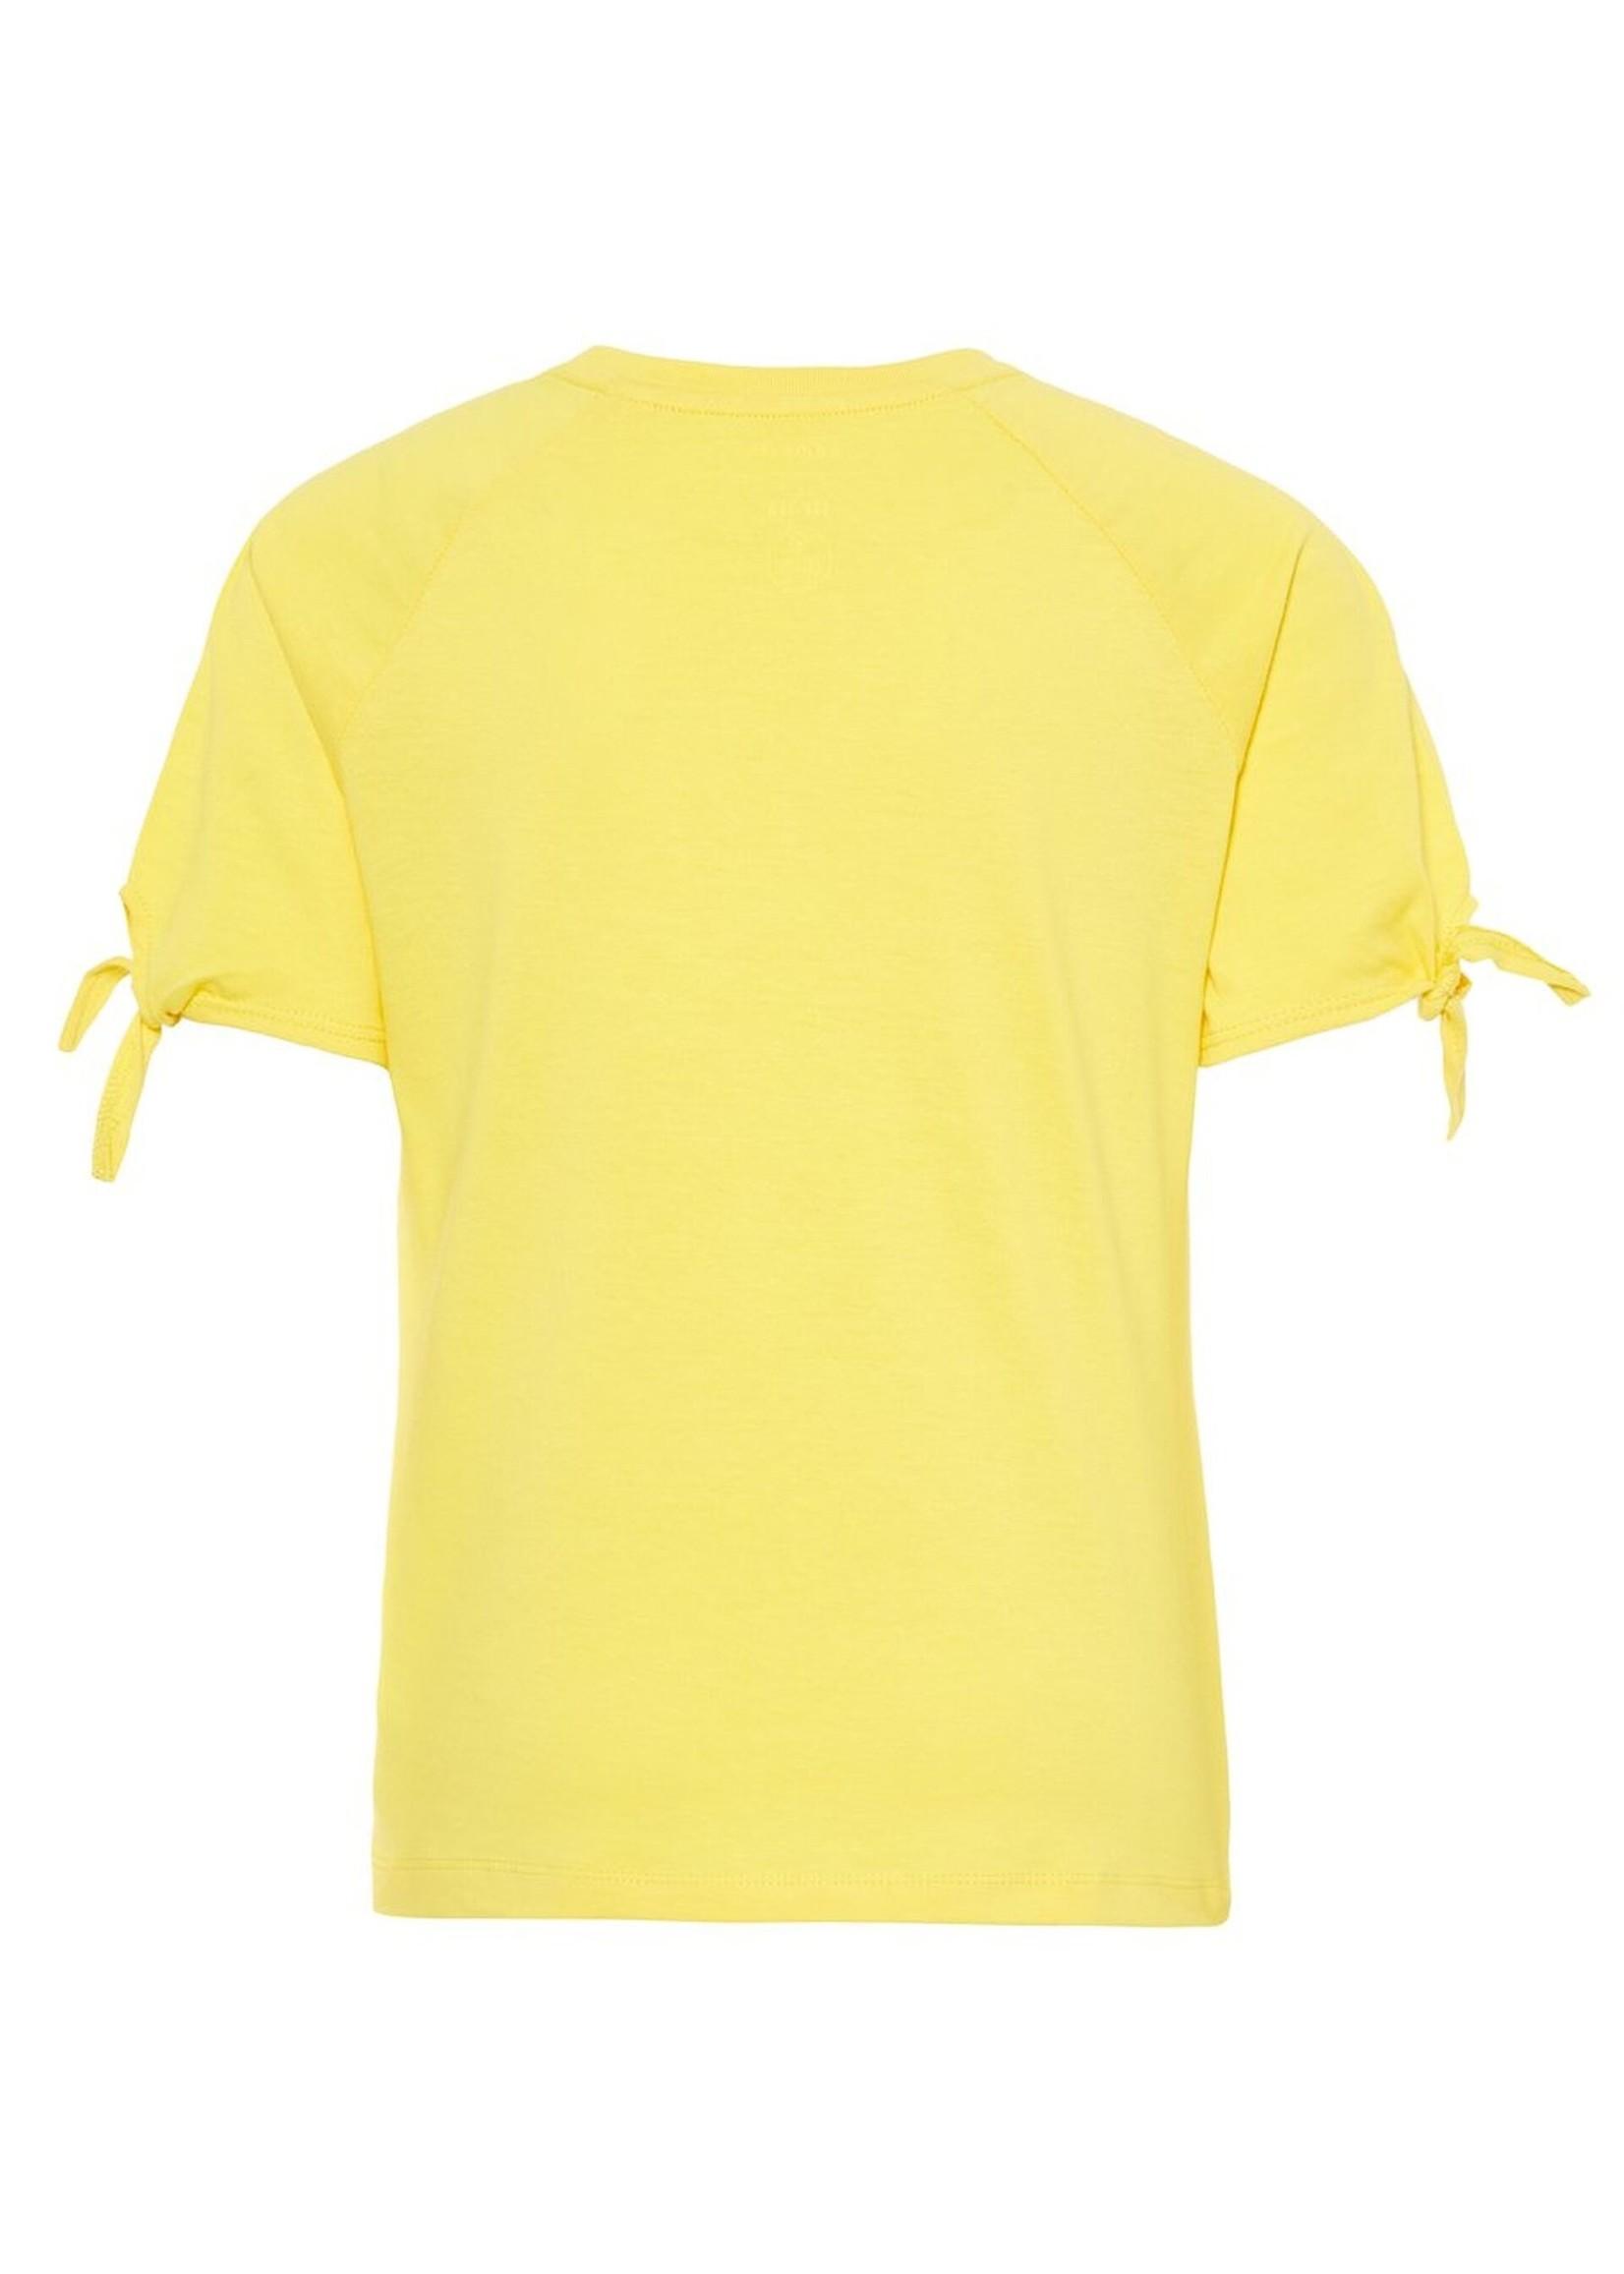 Name it T-shirt maat 116